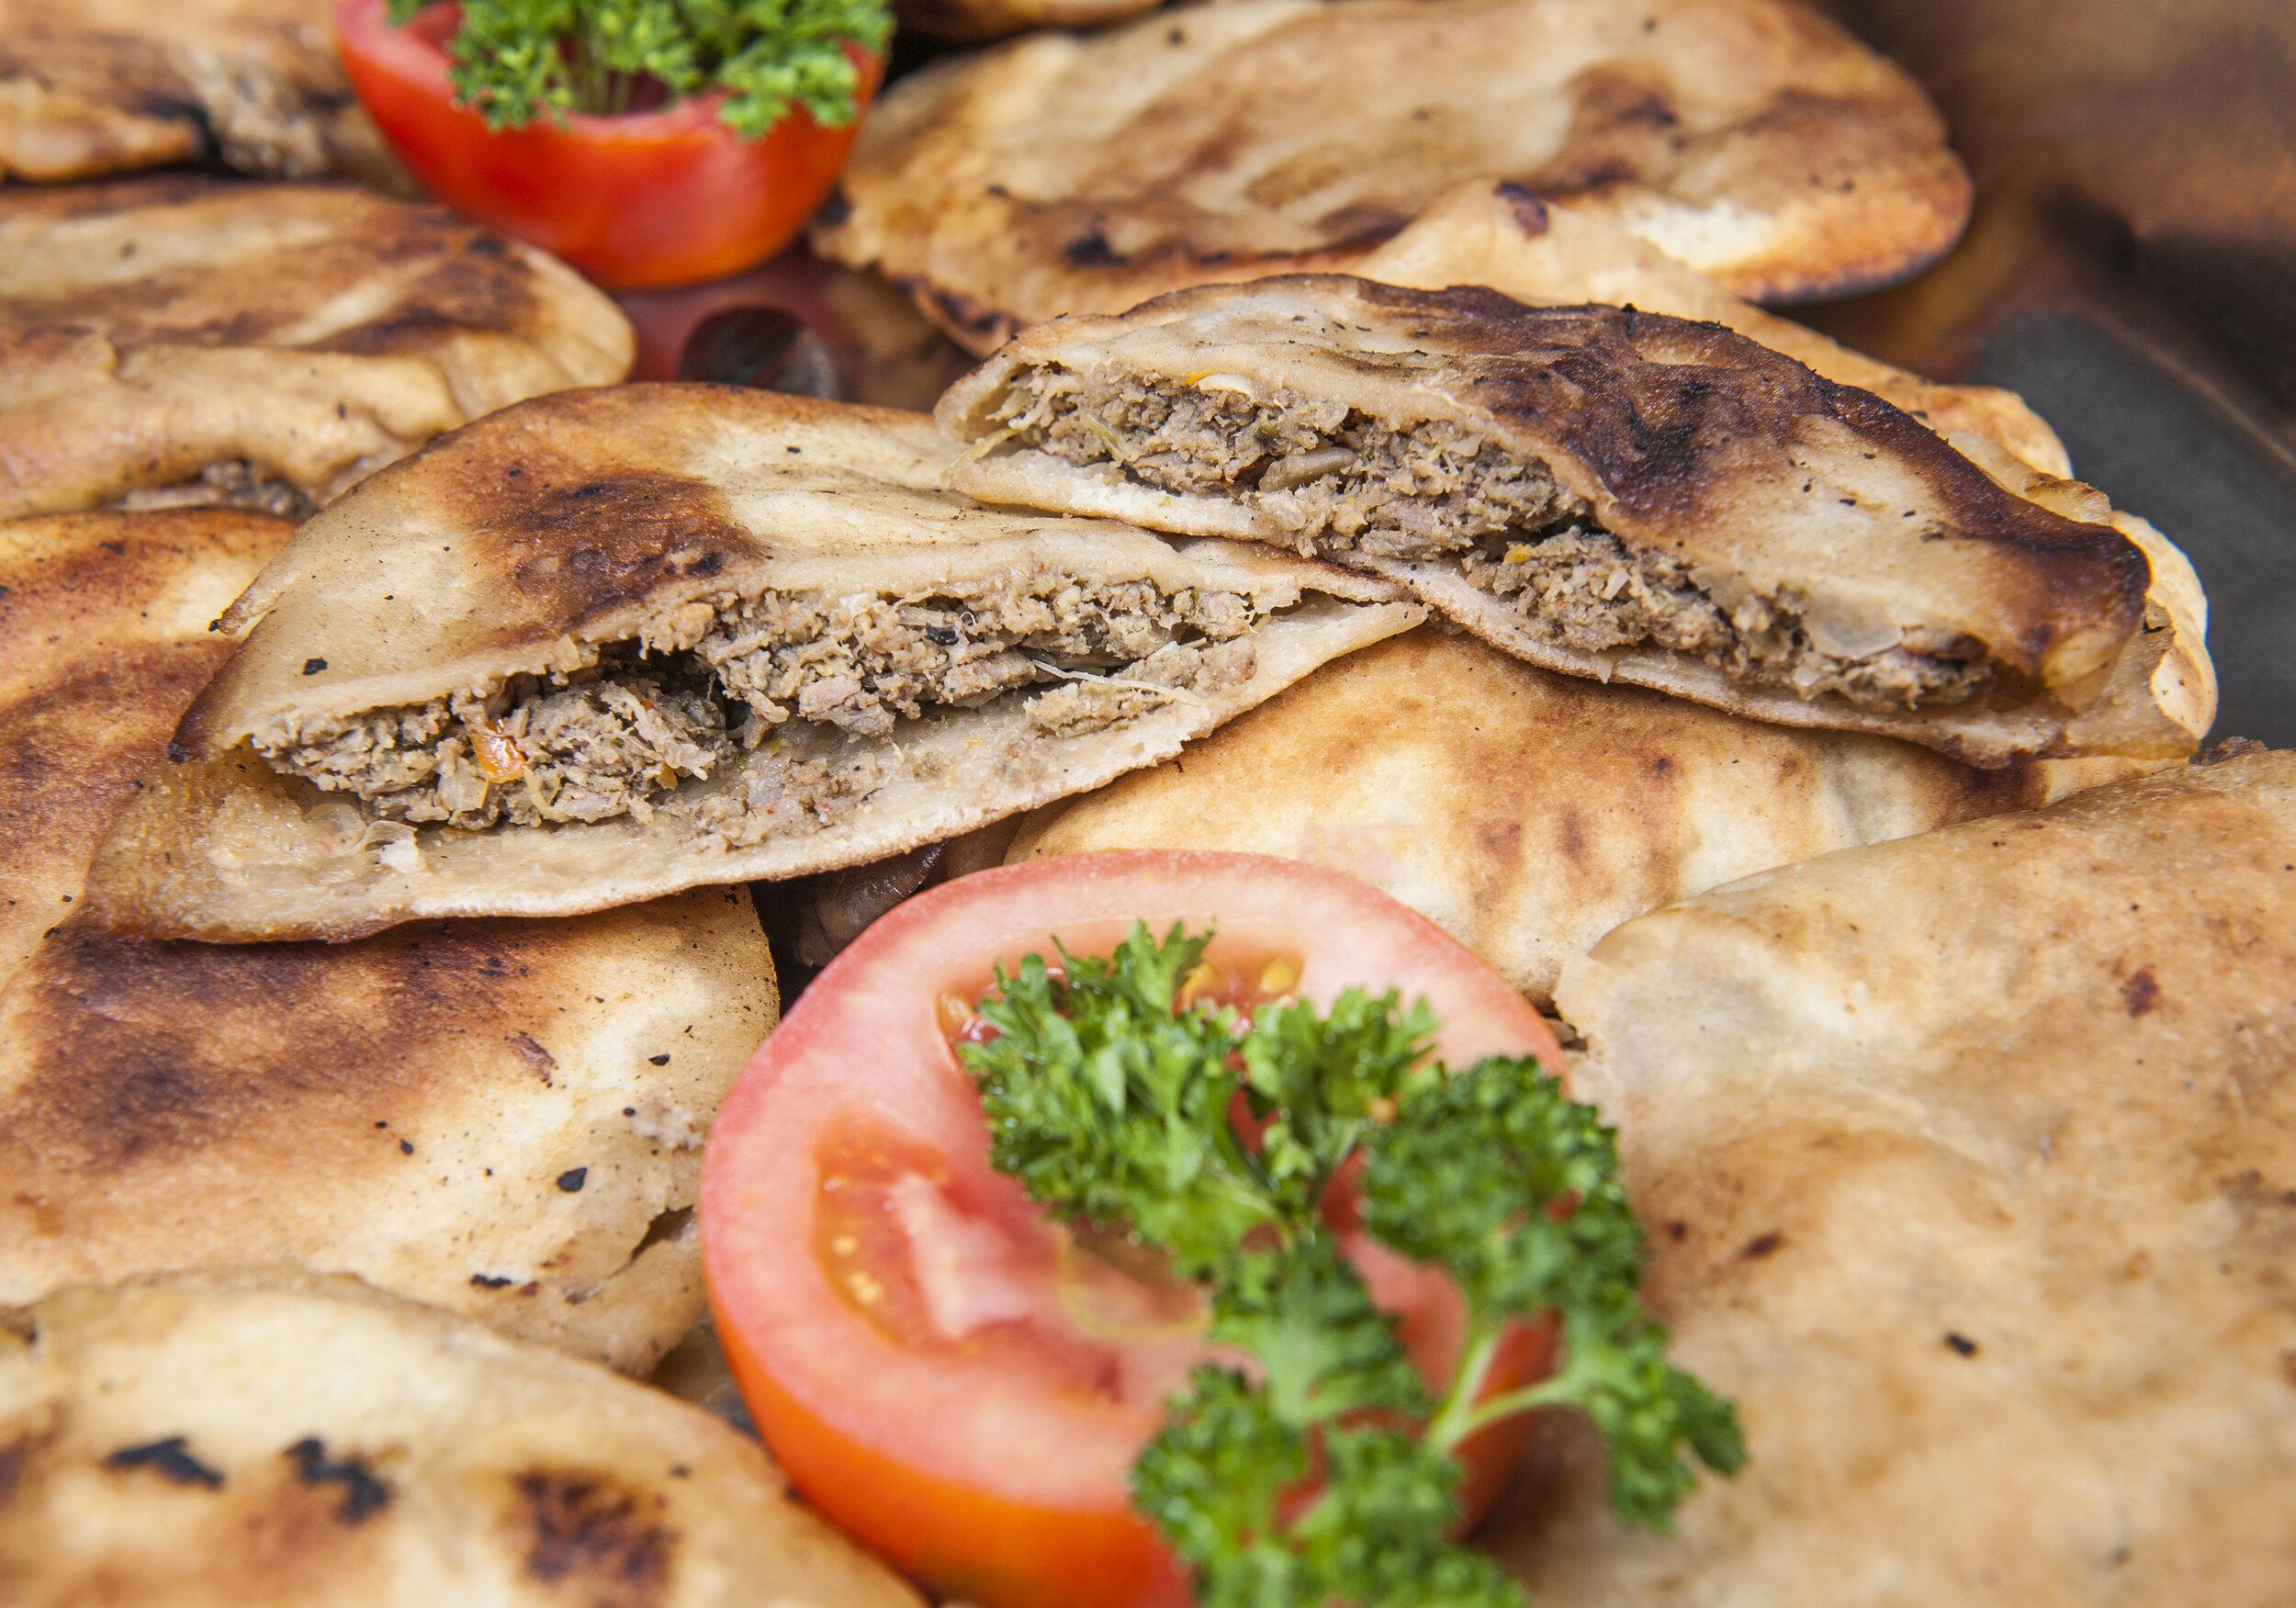 Hawawshi is a very popular Egyptian street food.